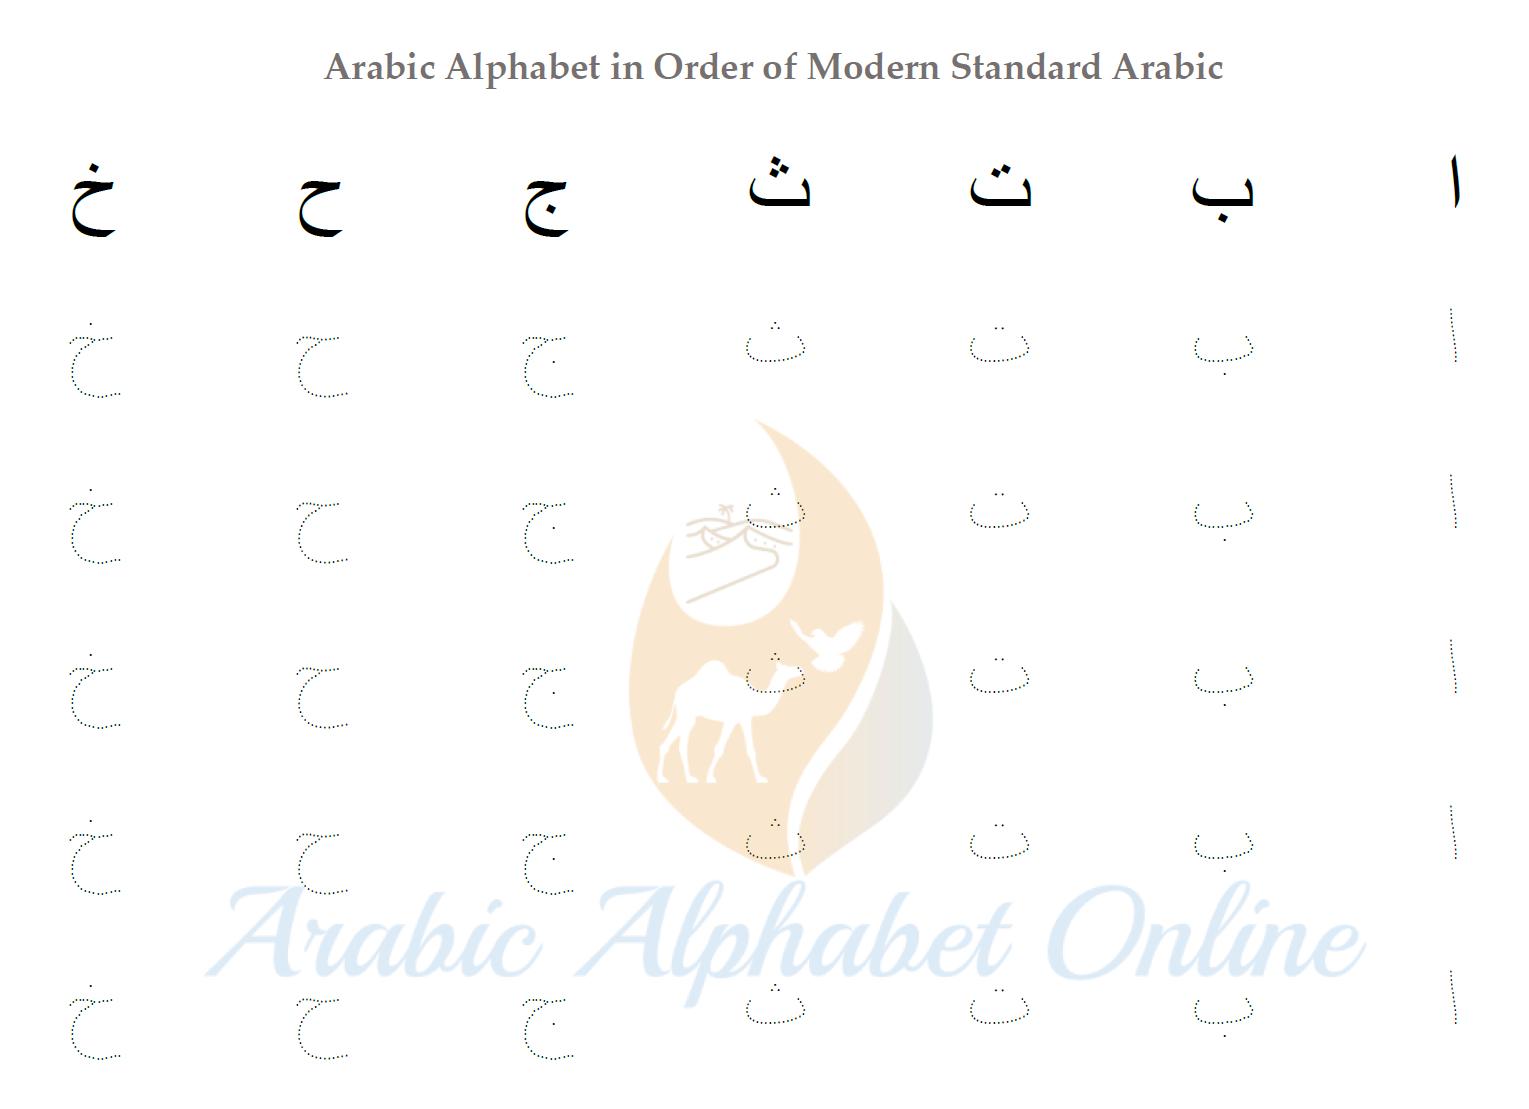 Arabic Alphabet Tracing Worksheets - Arabic Alphabet Online